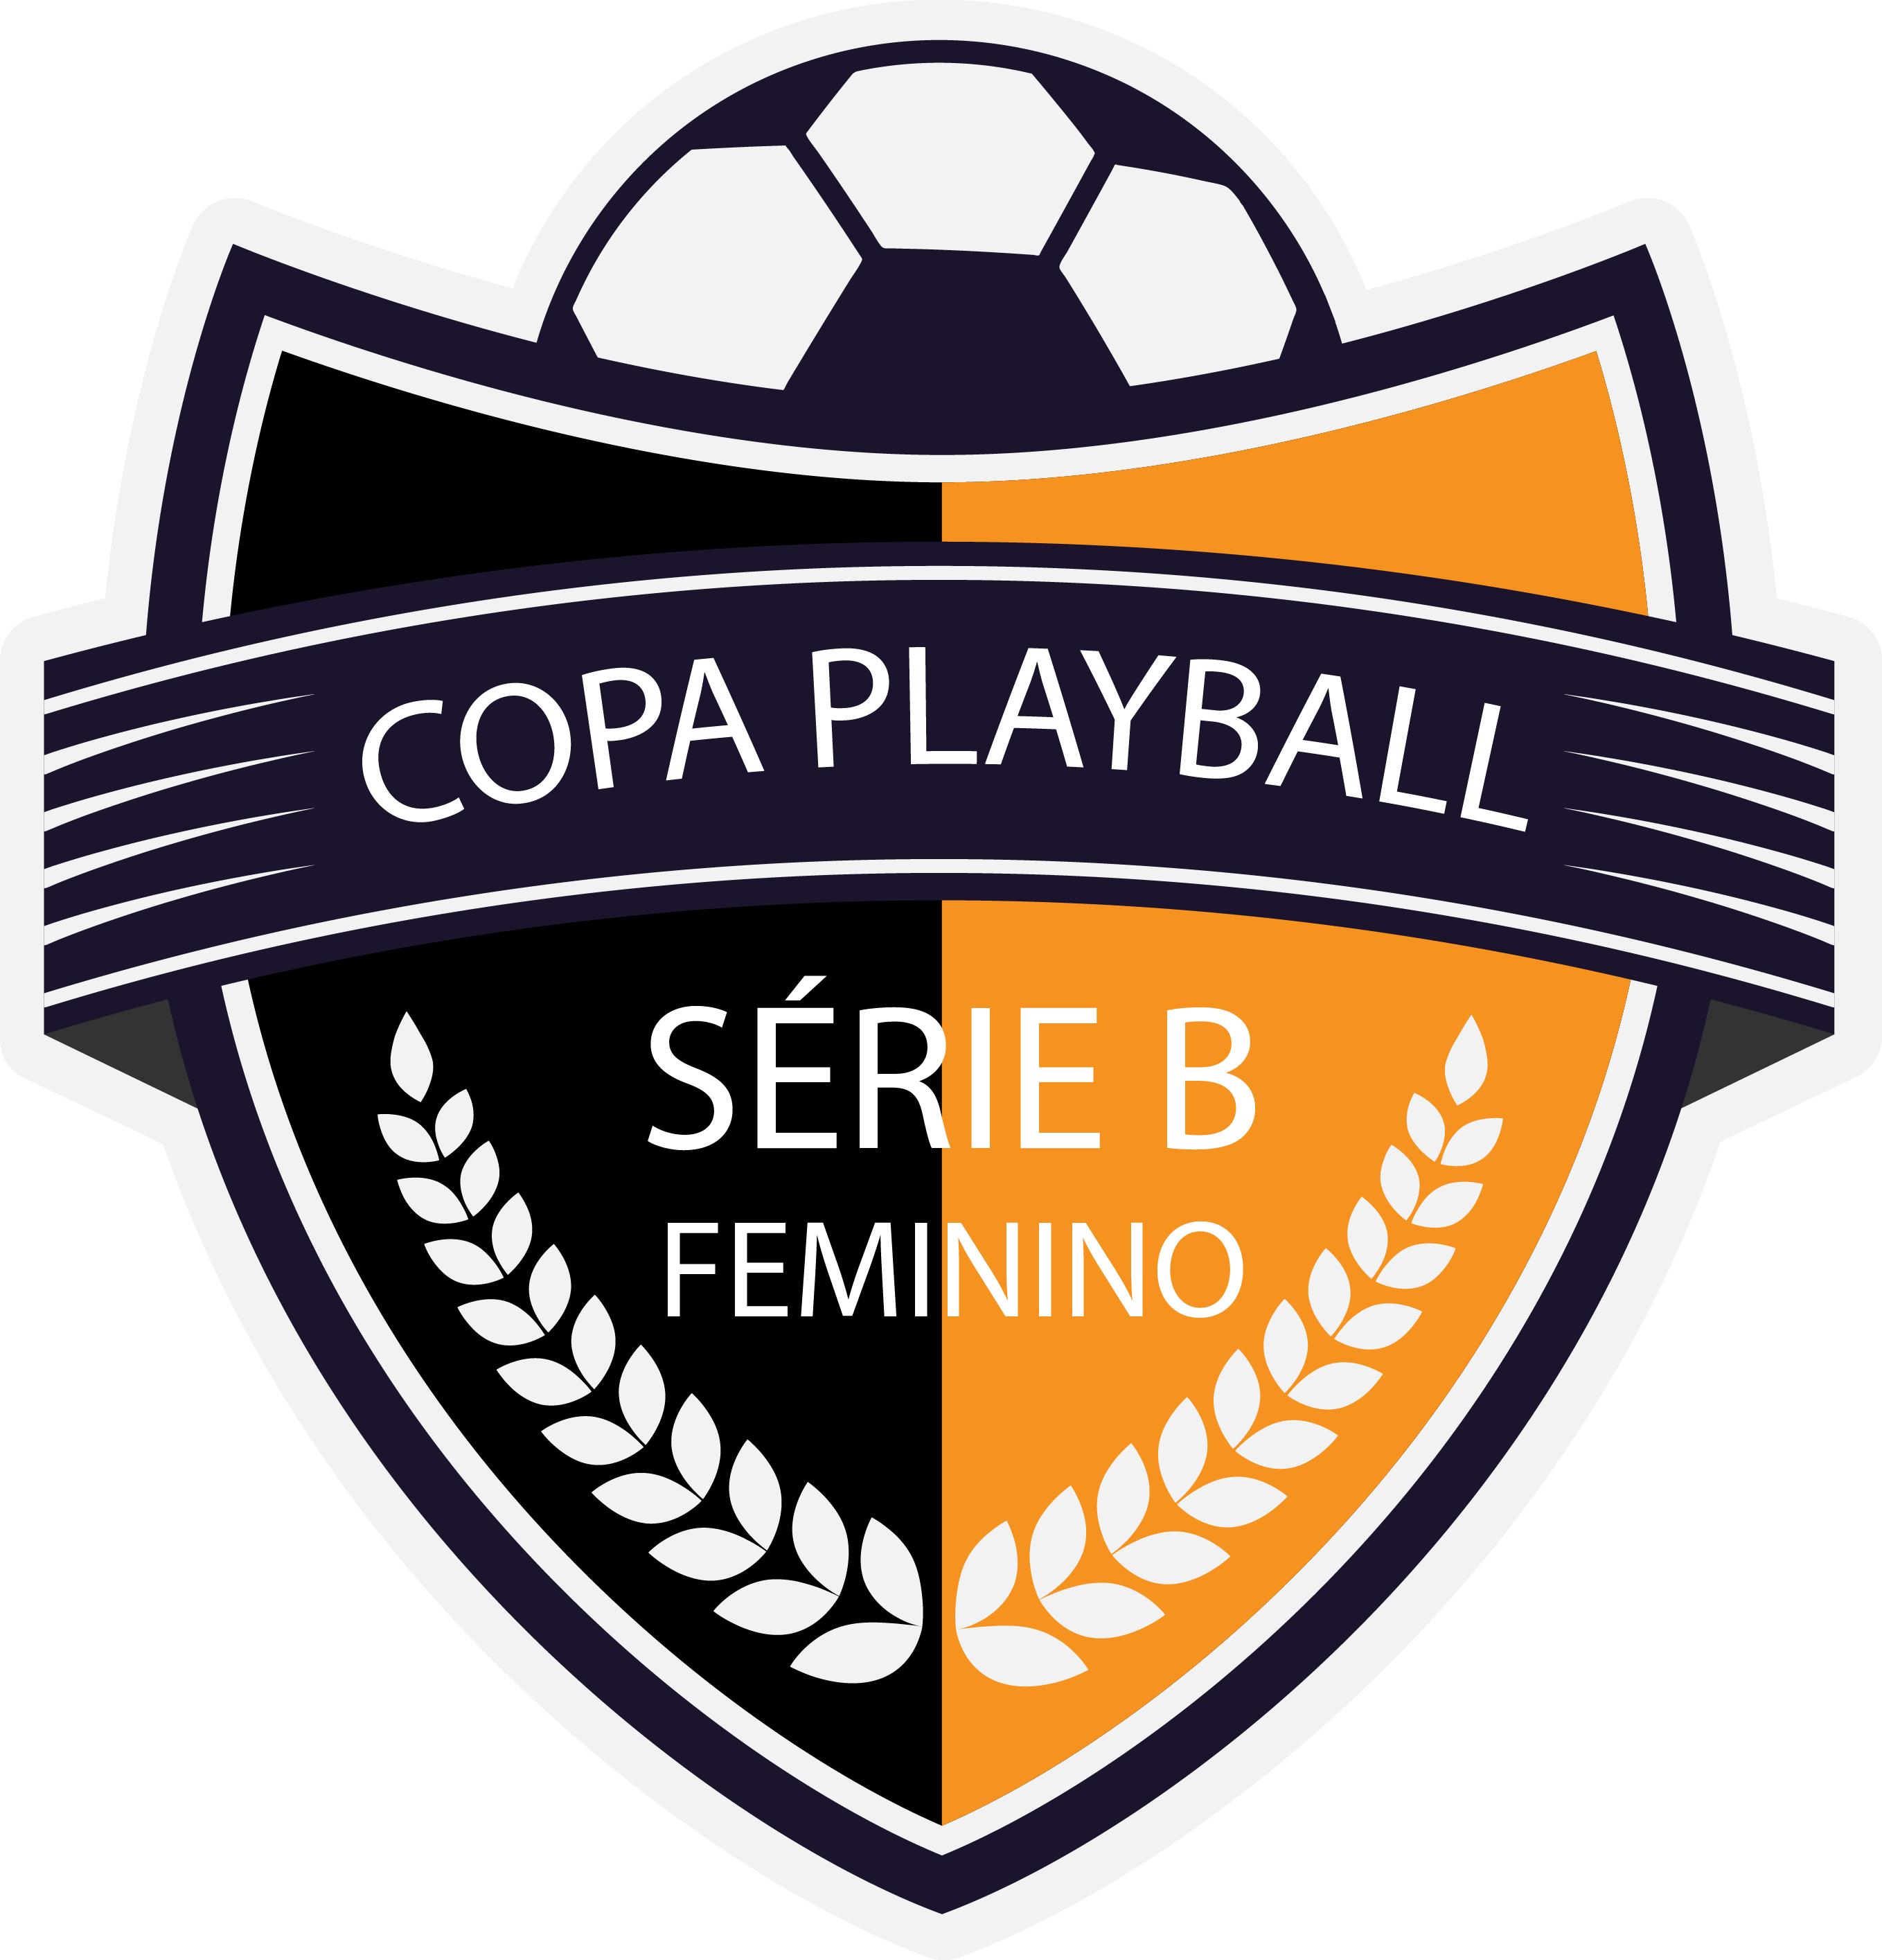 IV Copa Playball Feminino - Série B